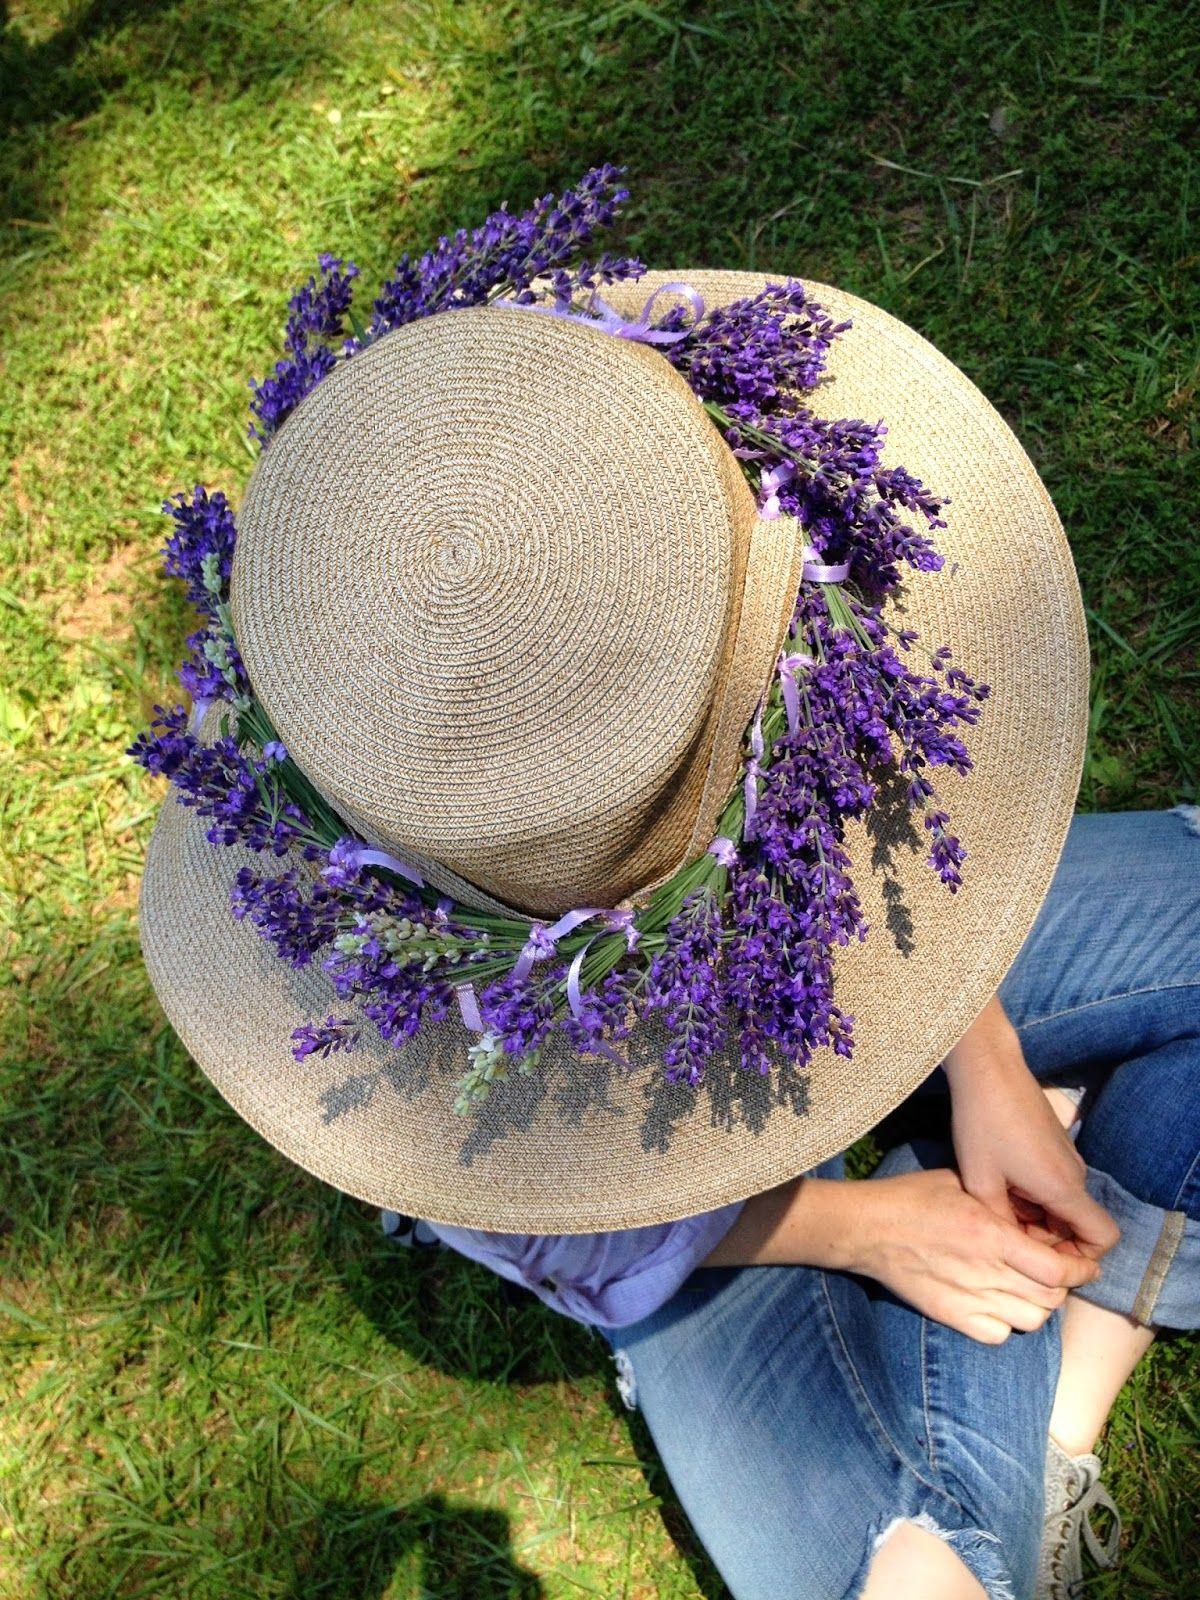 Sunshine Lavender Farm: 2014 Lavender Harvest Celebration